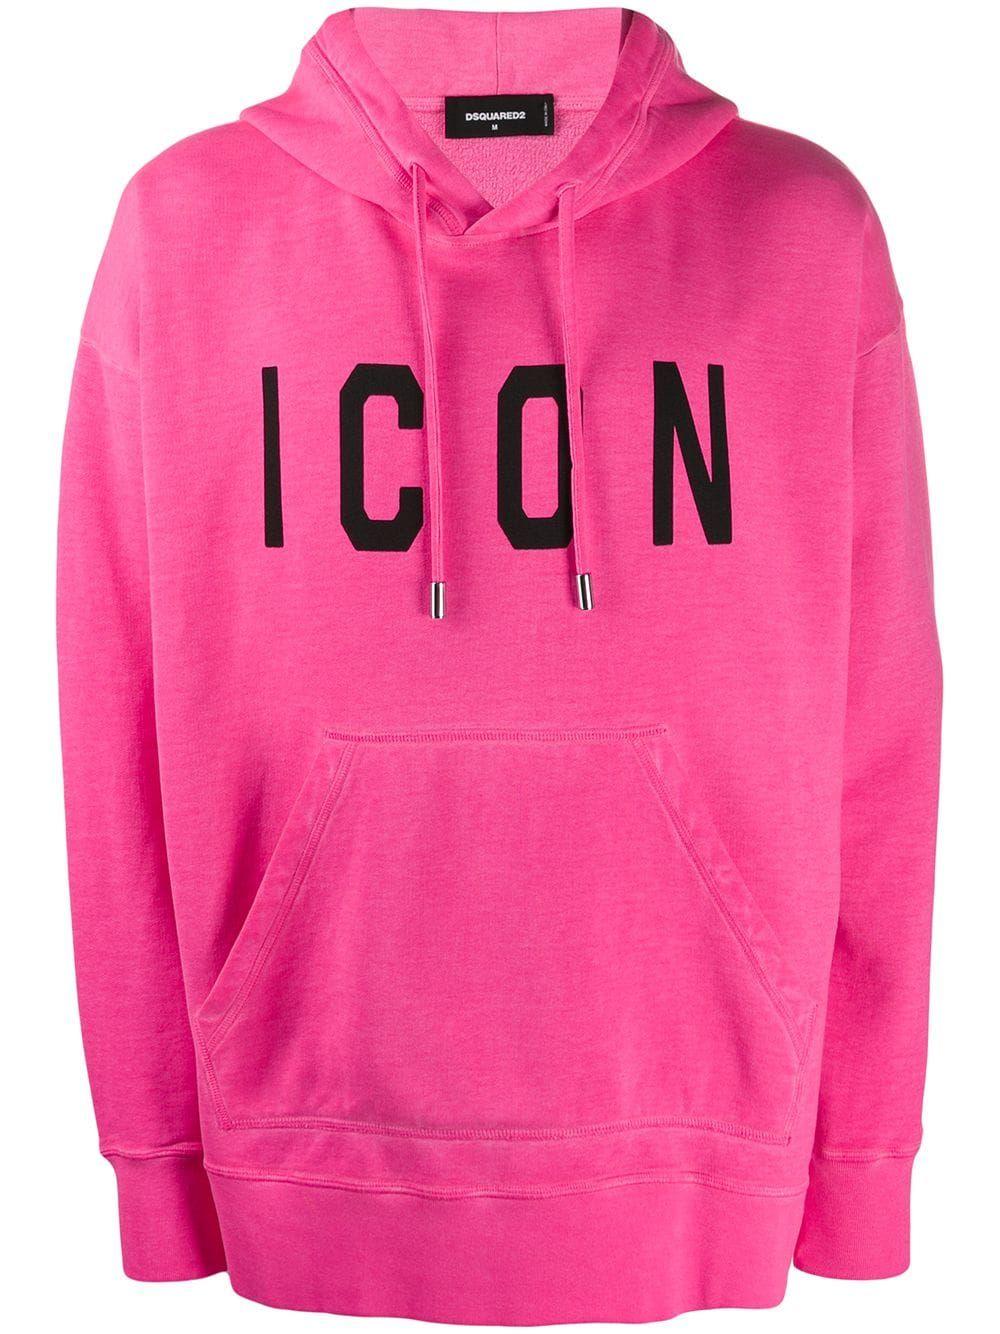 Dsquared2 Icon Logo Hoodie Farfetch Hoodies Pink Hoodie Timeless Wardrobe Staples [ 1334 x 1000 Pixel ]